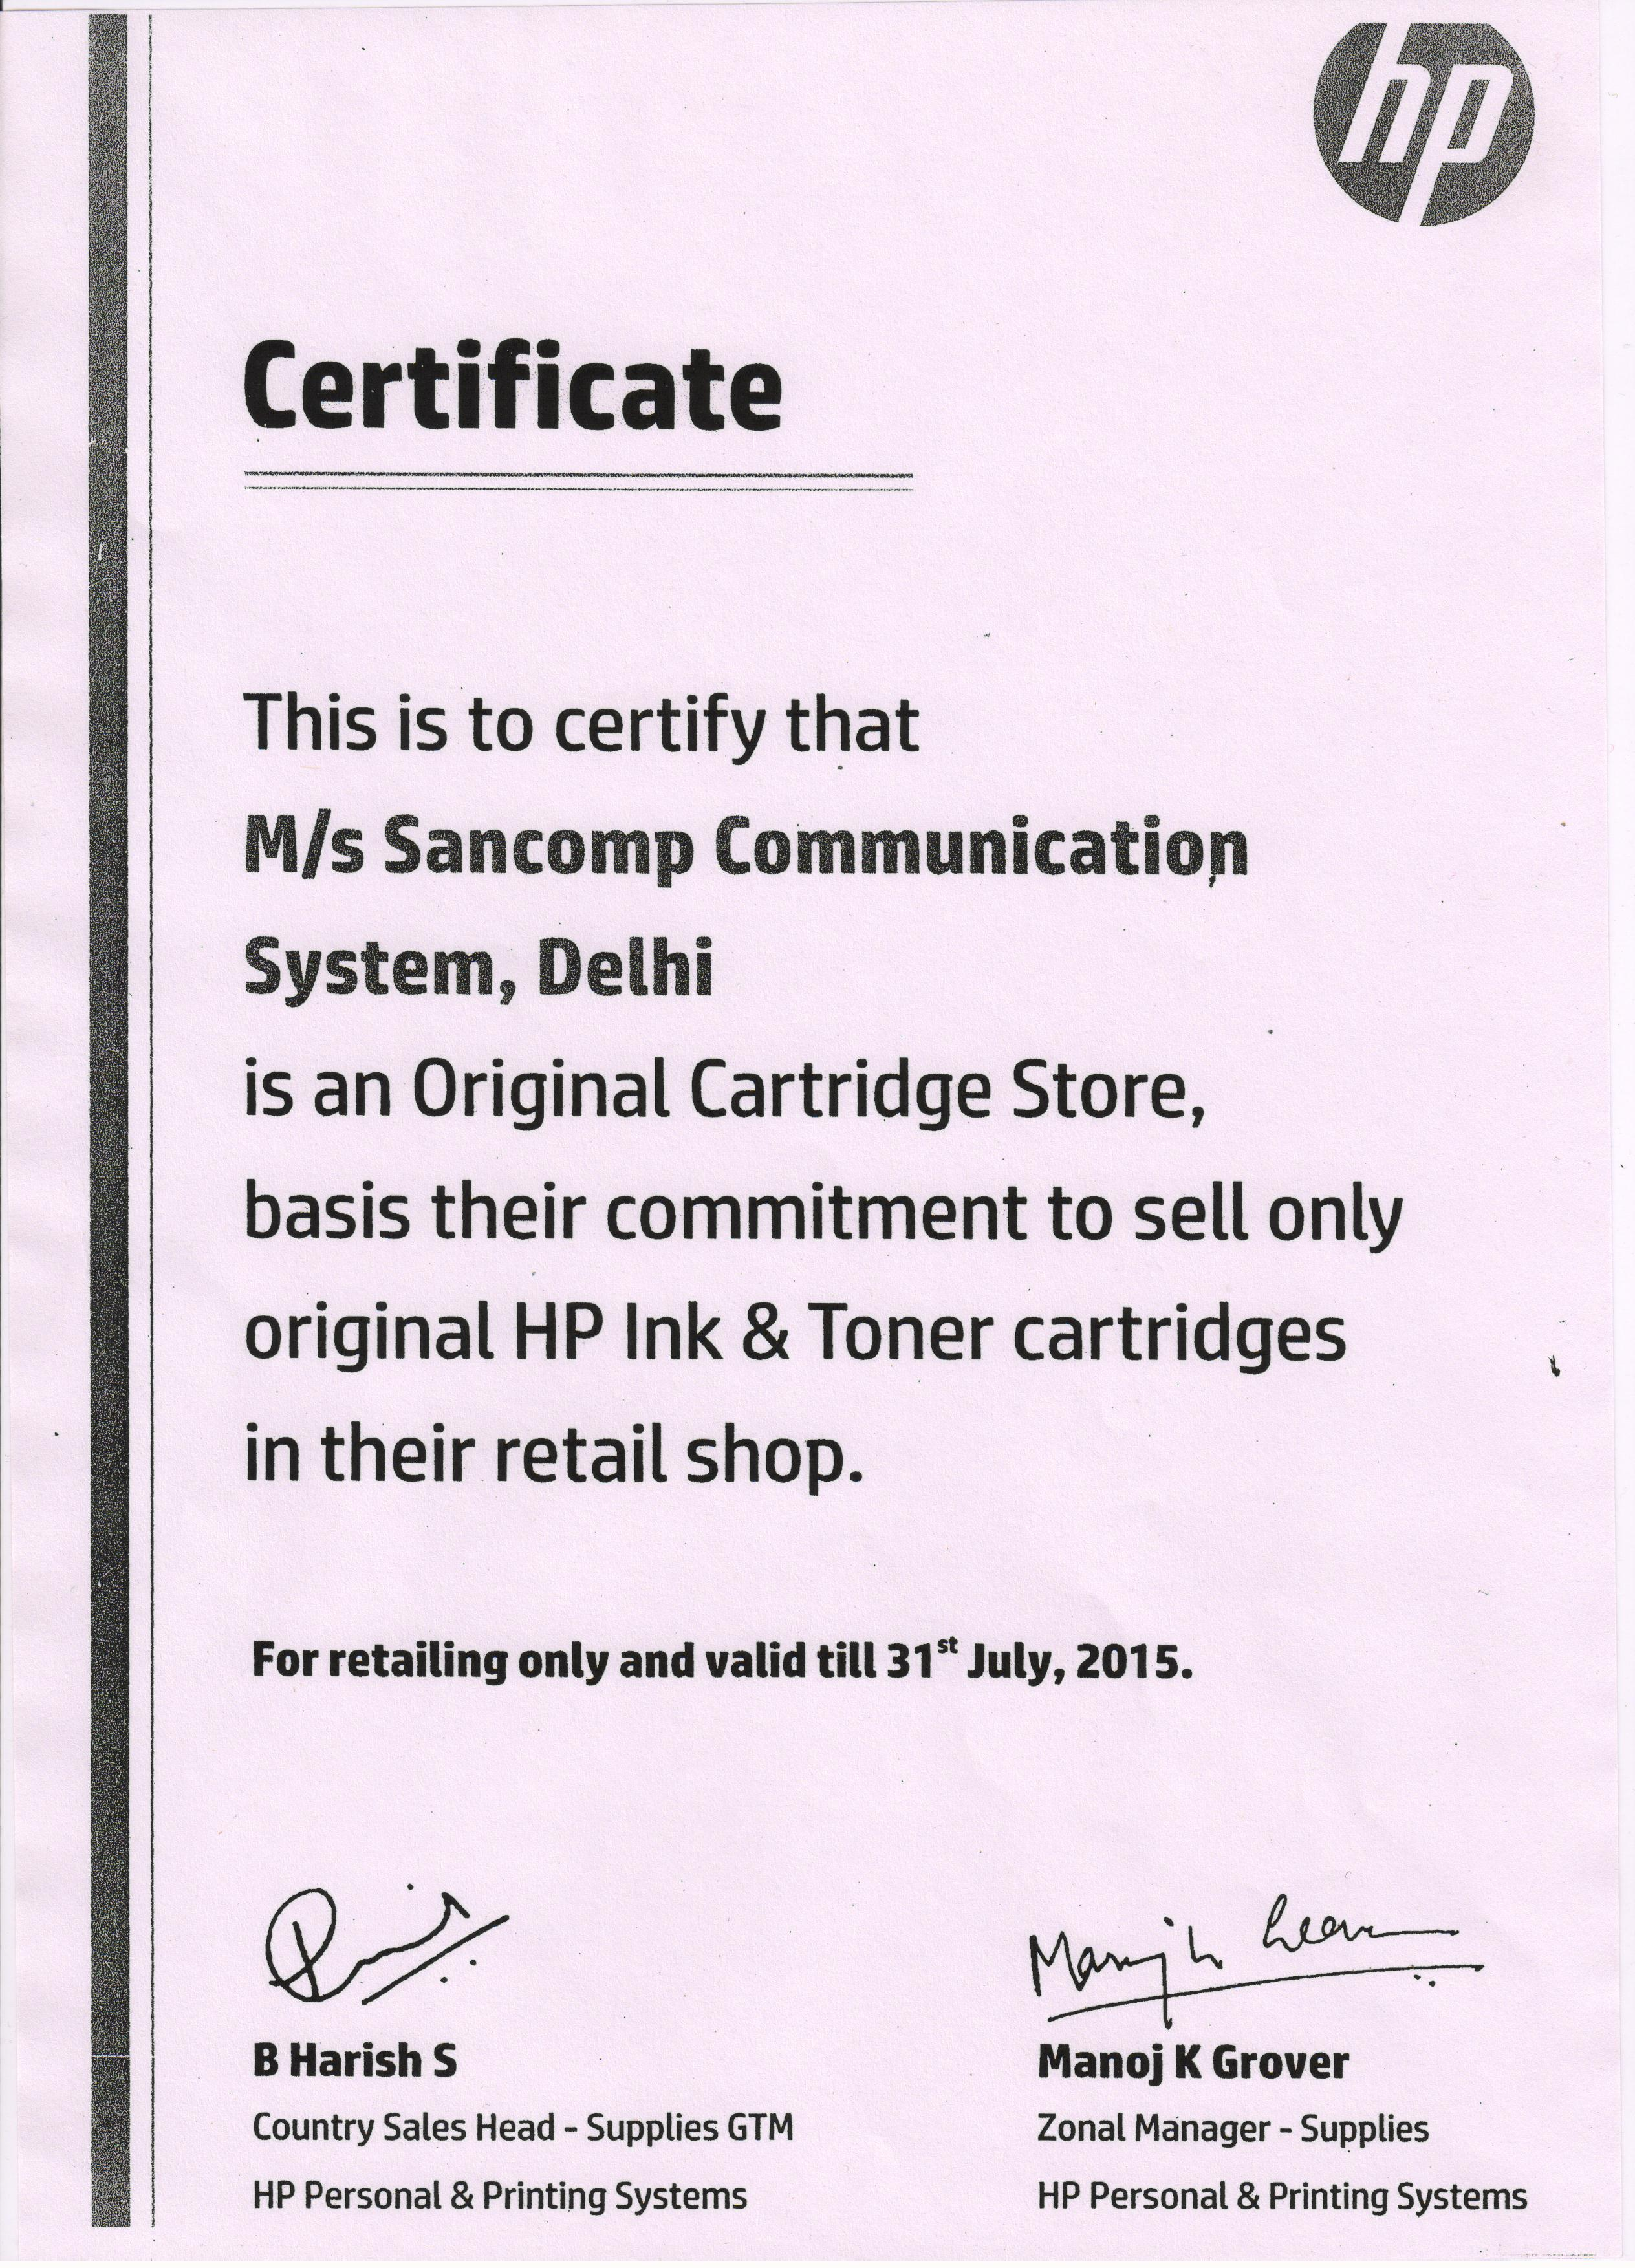 Sancomp Communication Systems